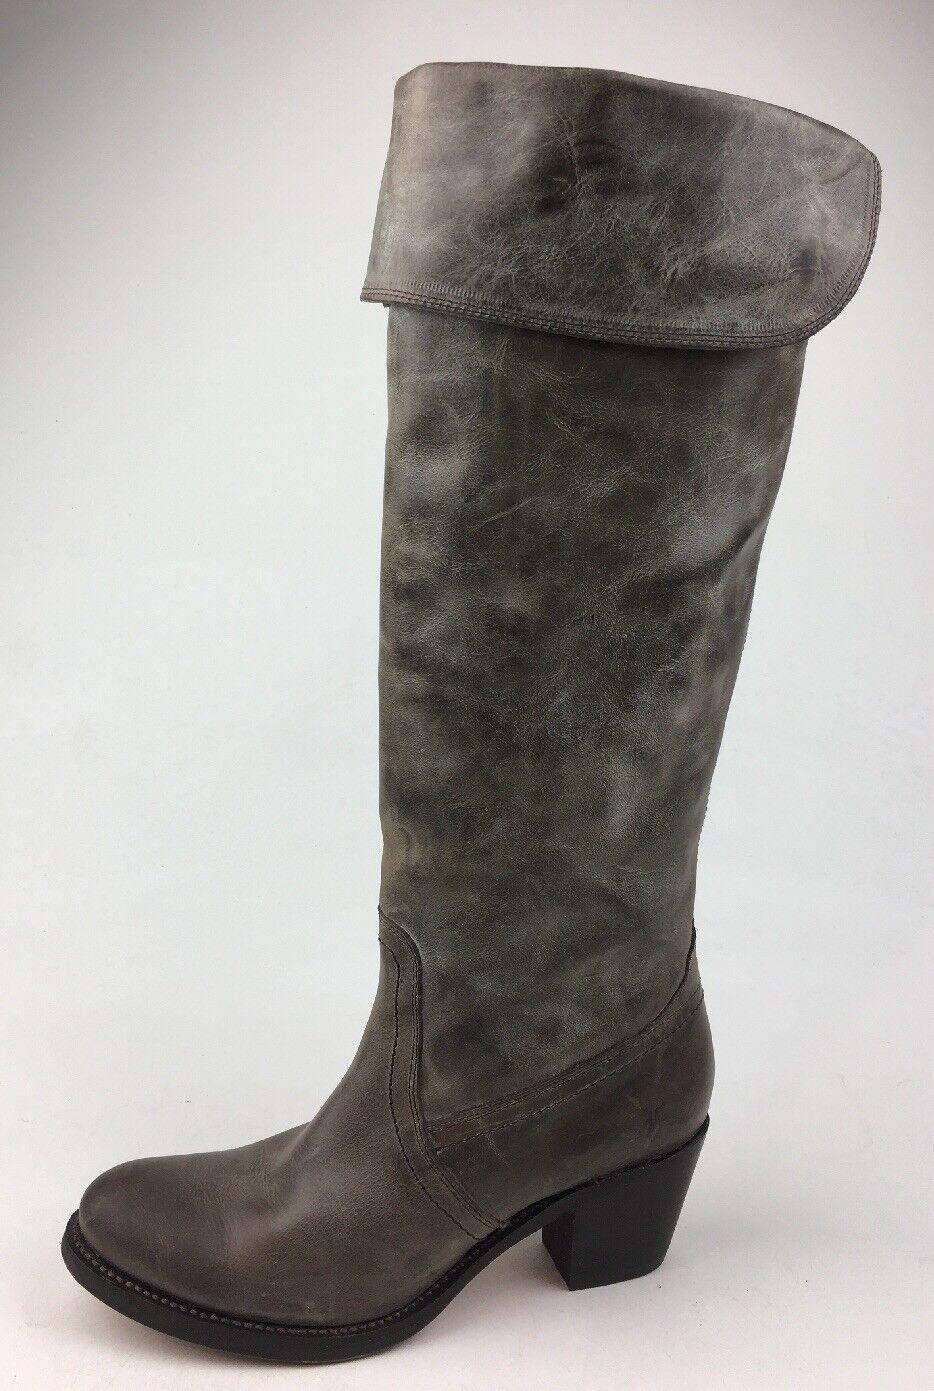 Frye Jane Tall Cuff Cuff Cuff Over Knee Size Stivali Size Knee 6.5B, SLT Slate 787190